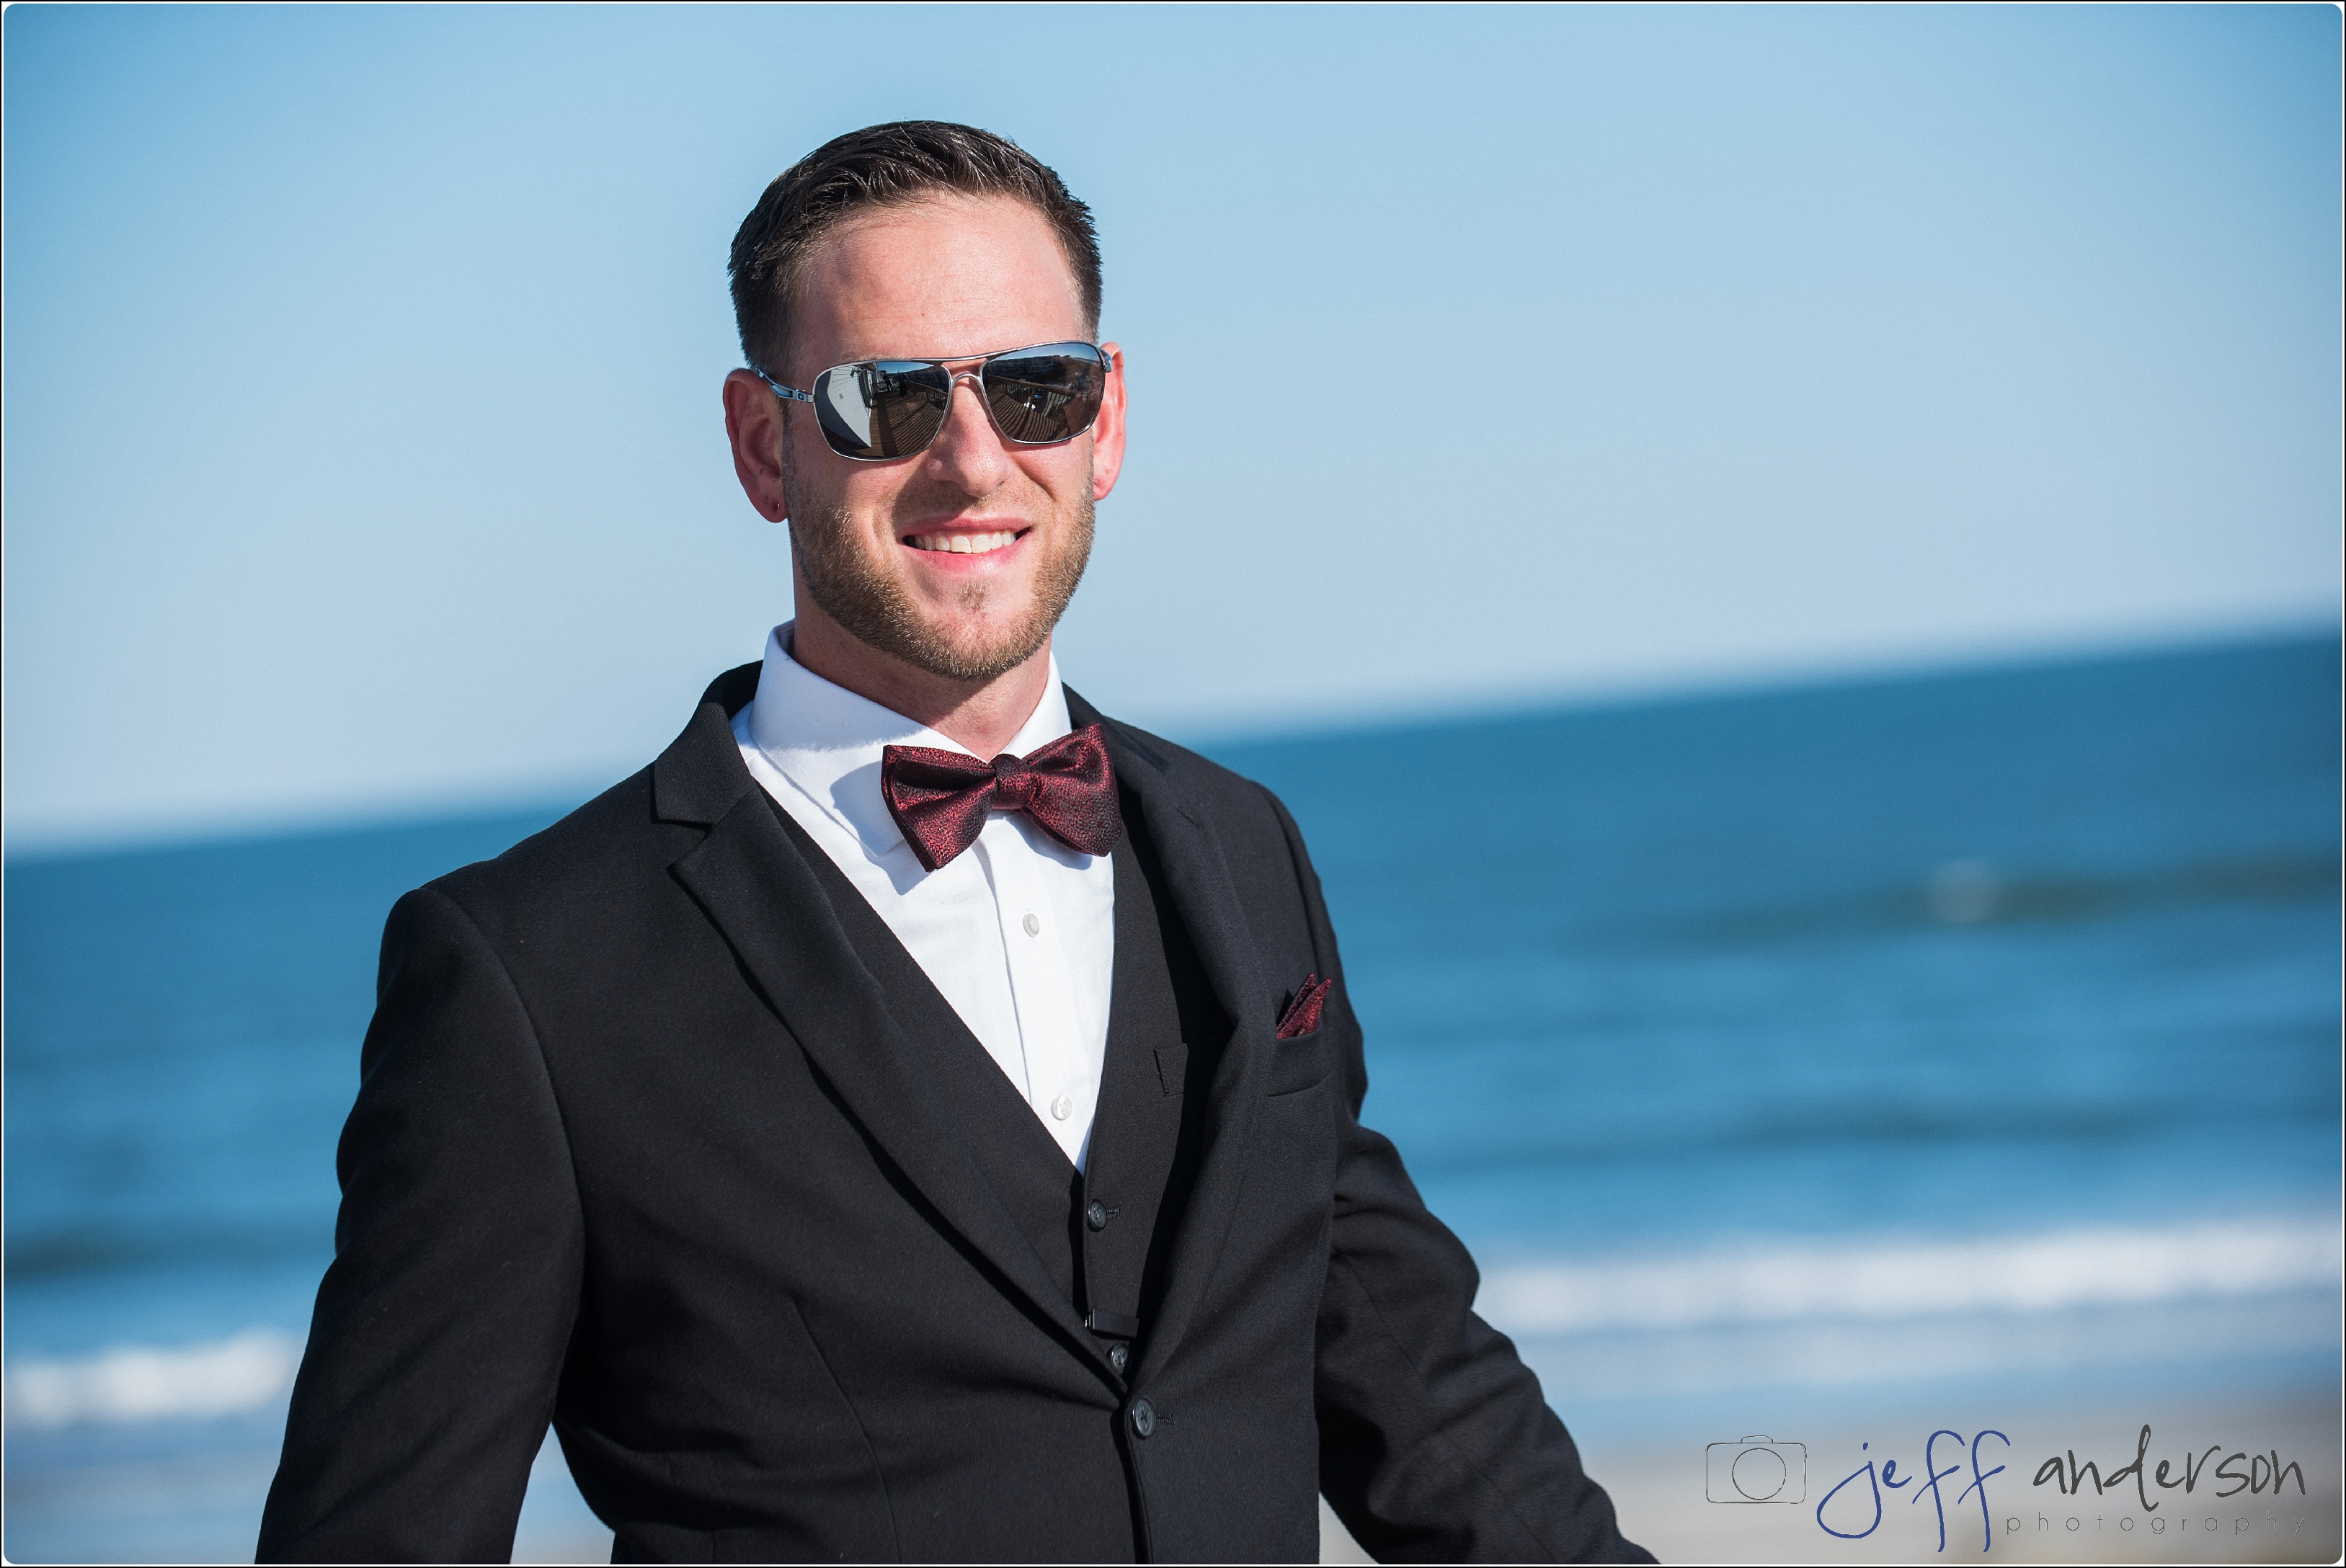 Jeff Anderson Photography | Wedding